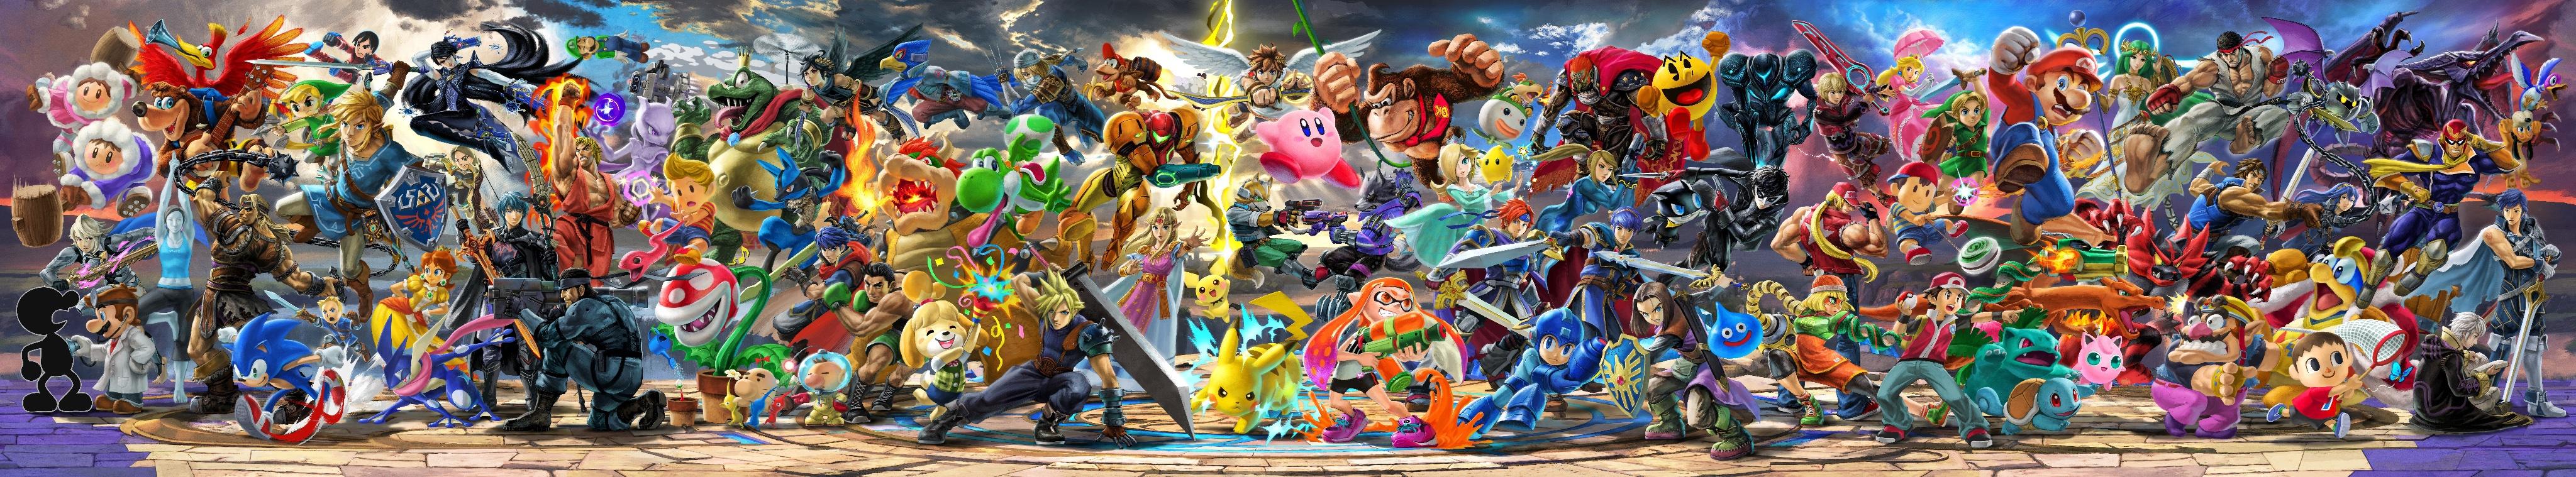 Super Smash Bros. Ultimate обновлен до версии 8.0.0 1